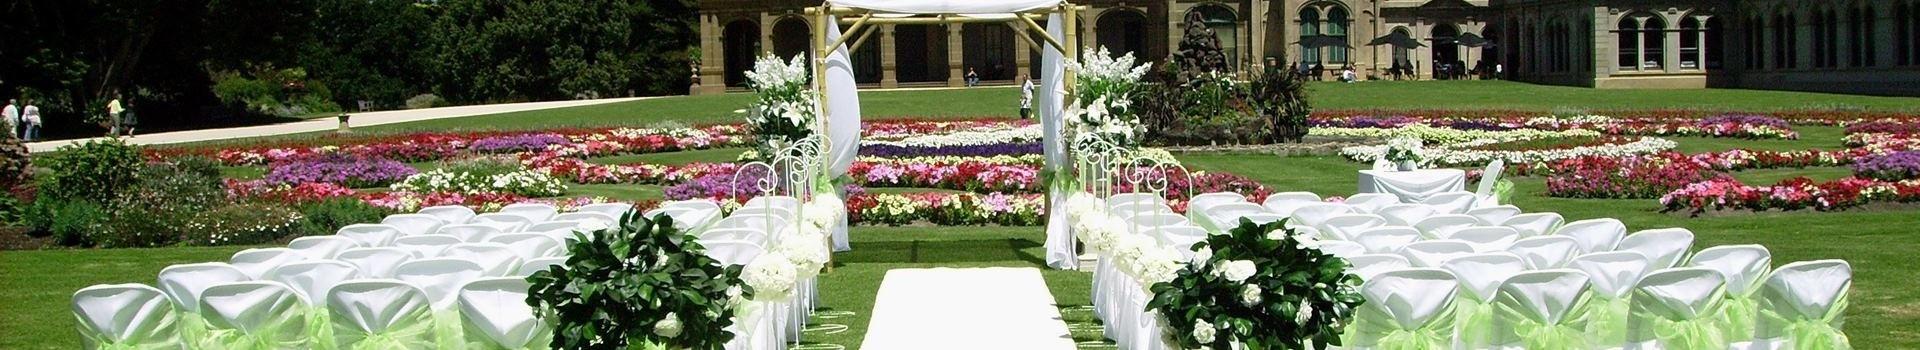 Garden Weddings Melbourne Ceremony Decor Hire